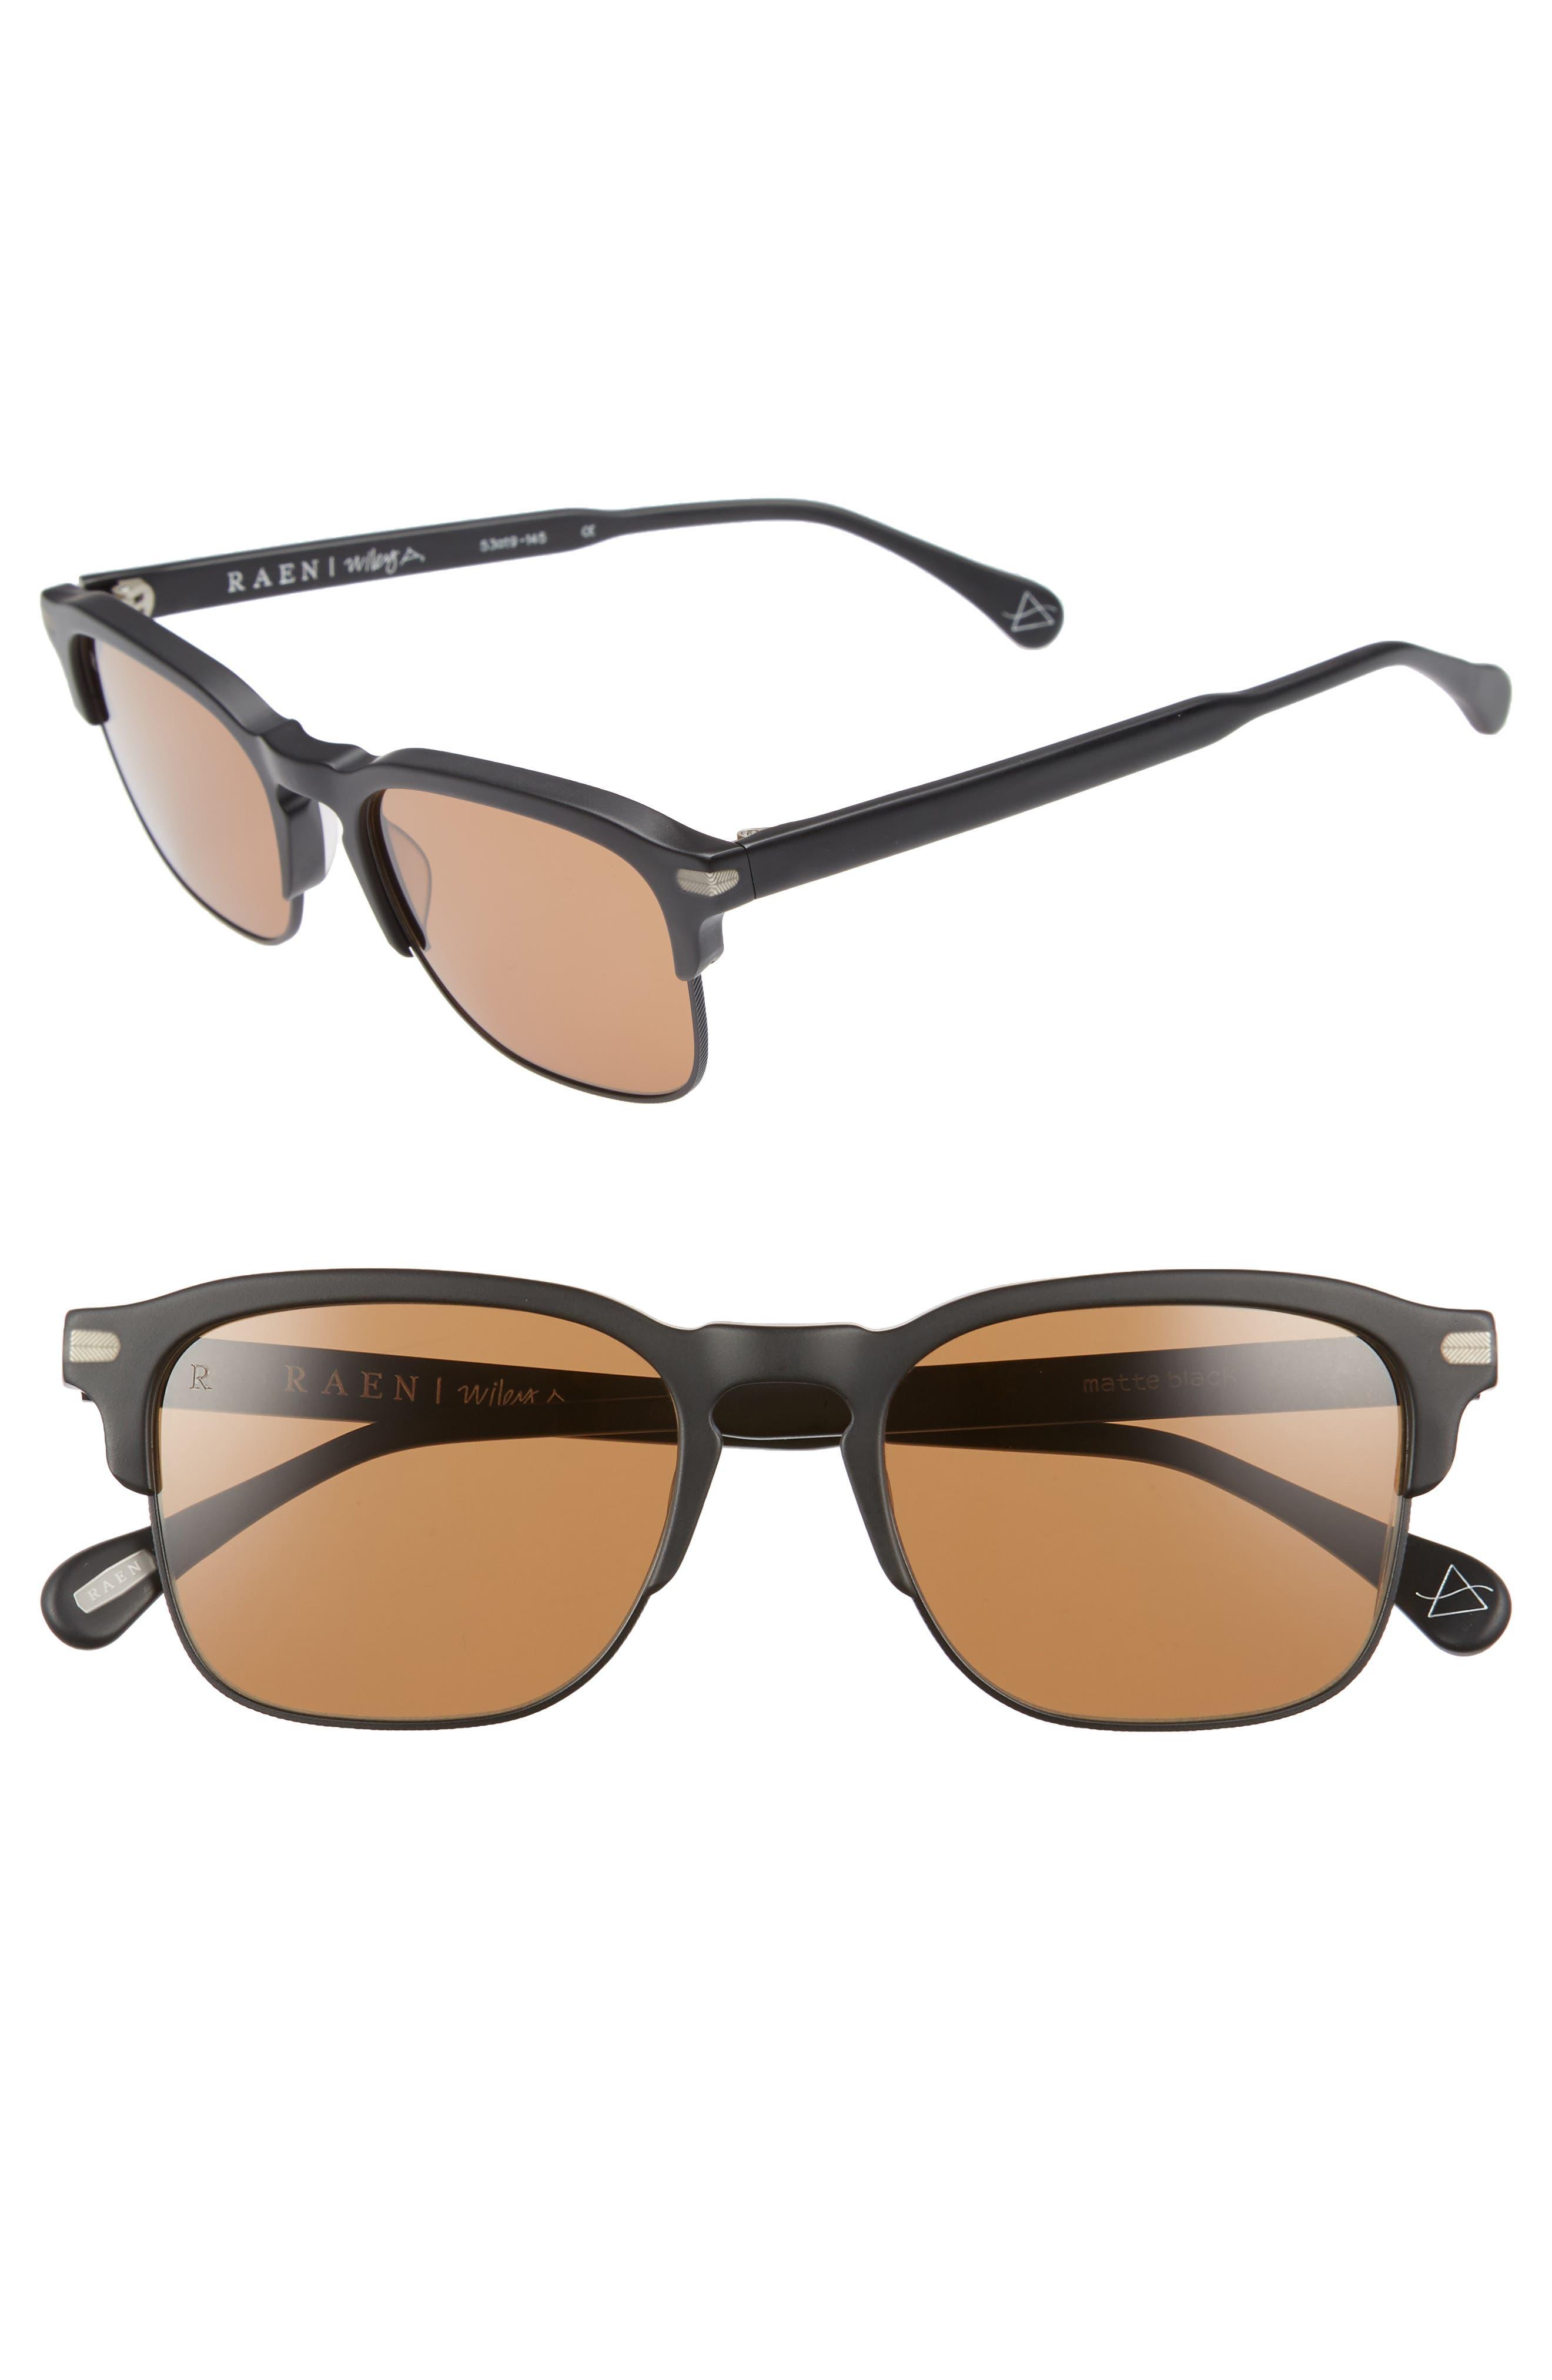 Wiley A 53mm Sunglasses,                             Main thumbnail 1, color,                             Matte Black